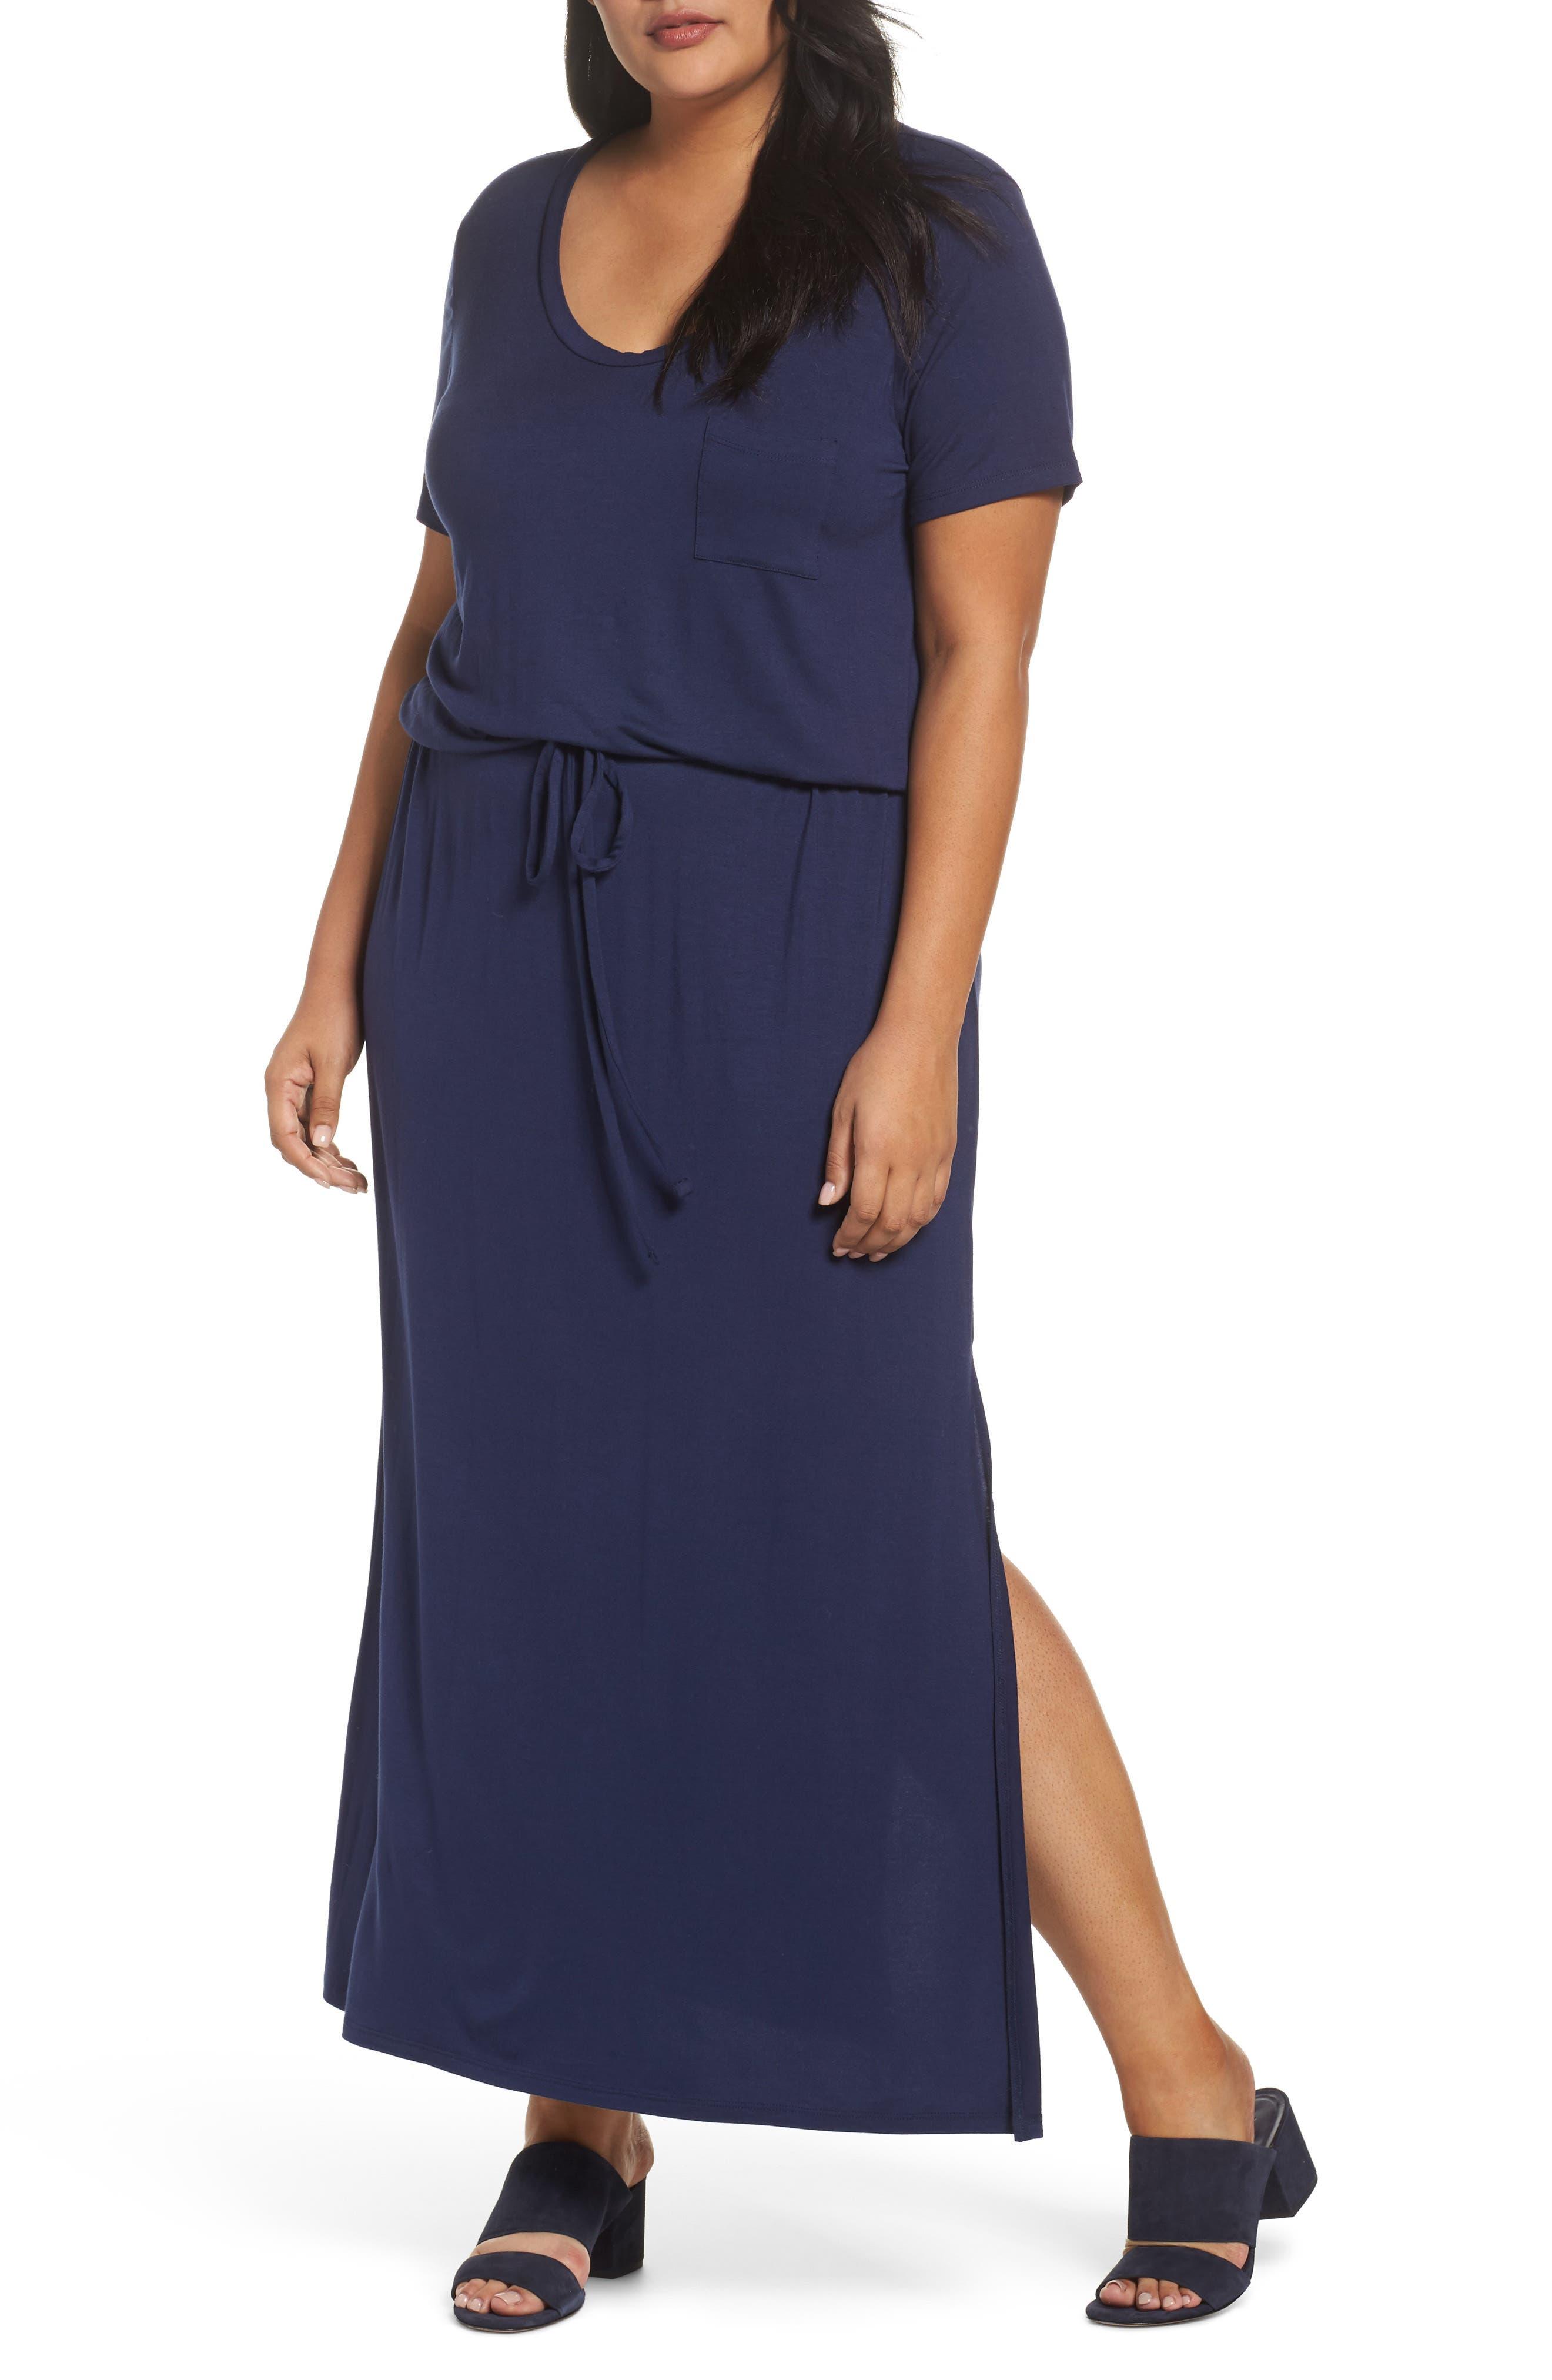 Alternate Image 1 Selected - Caslon® Knit Drawstring Waist Maxi Dress (Plus Size)